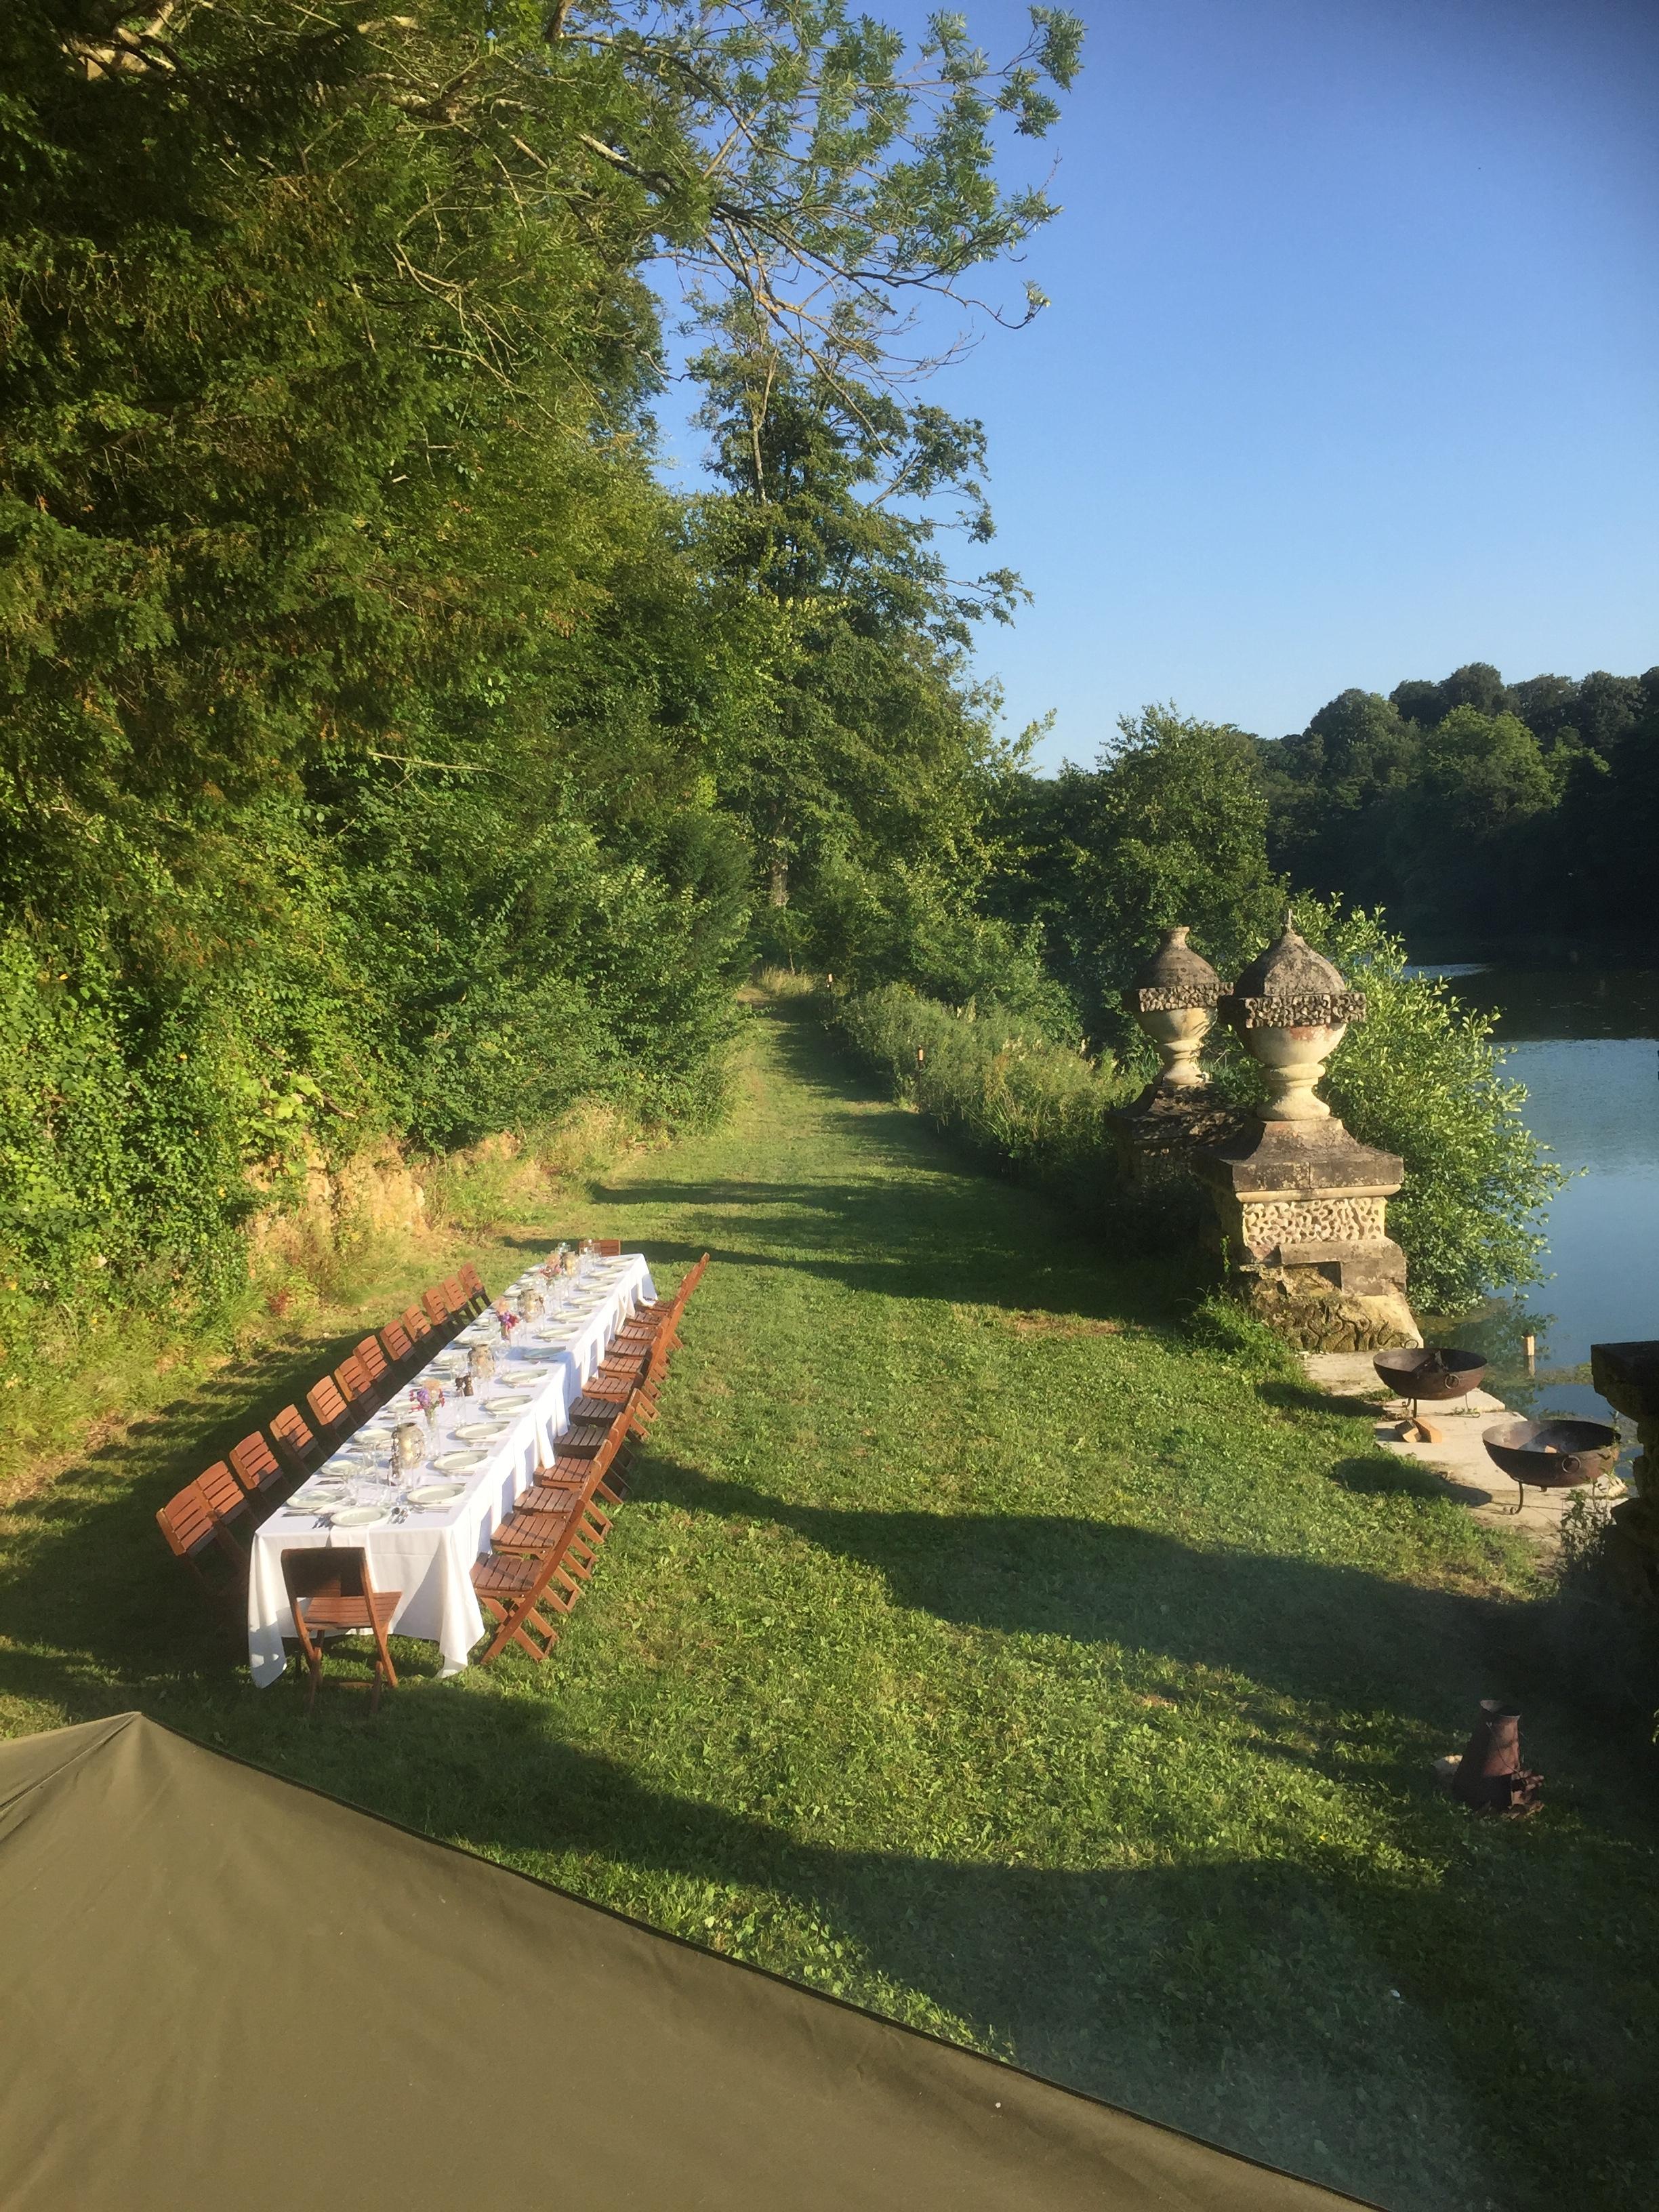 Field banquet Collaboration